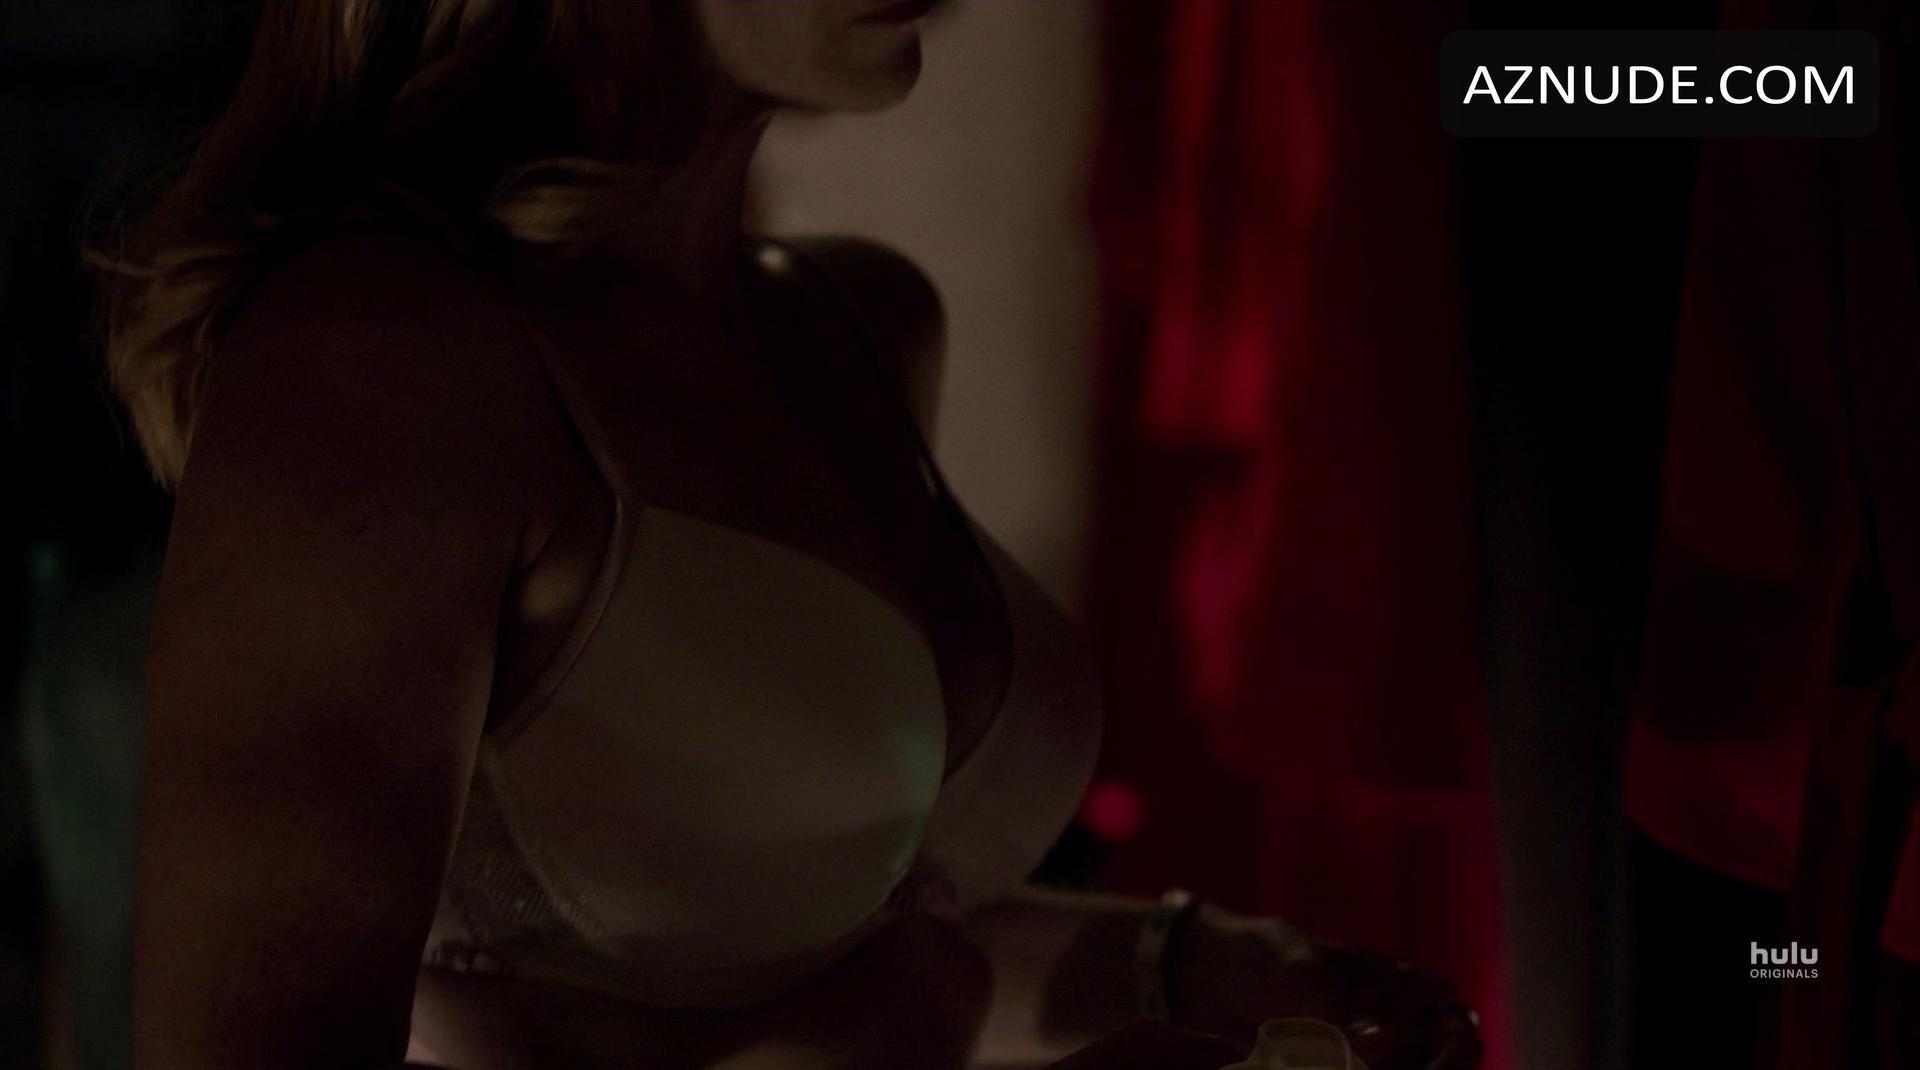 annie-wersching-hot-naked-photos-mature-women-sex-video-trailers